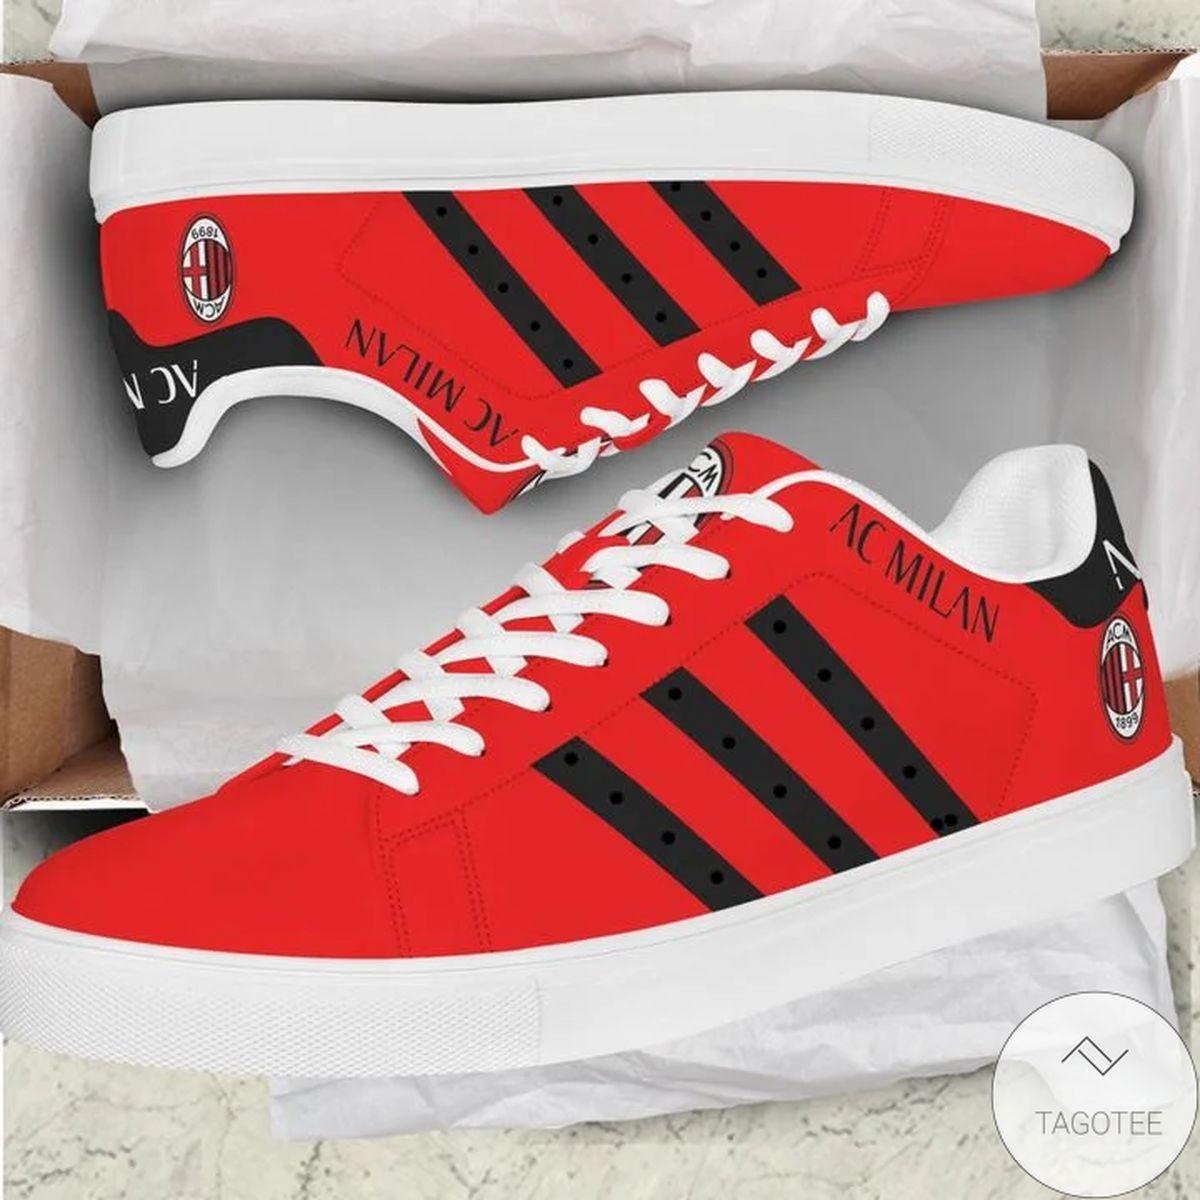 POD Ac Milan Red Version Stan Smith Shoes